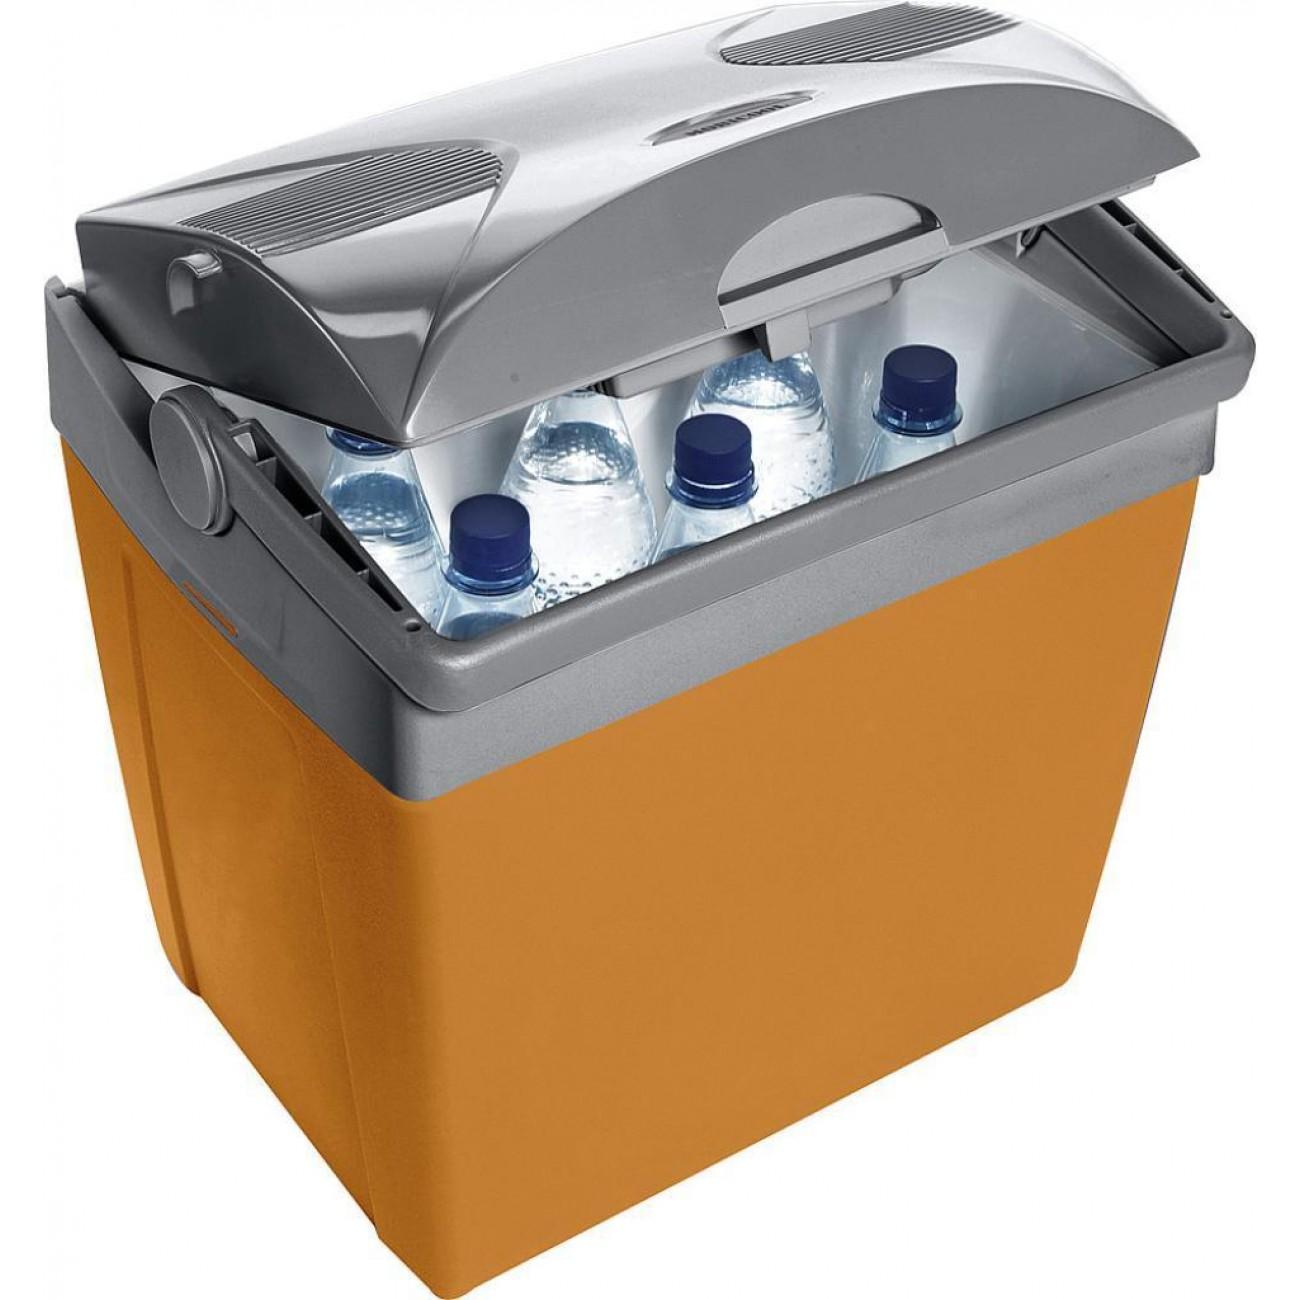 Хладилна чанта MOBICOOL U26DC, 25 литра, 12V в Хладилни чанти - Mobicool | Alleop